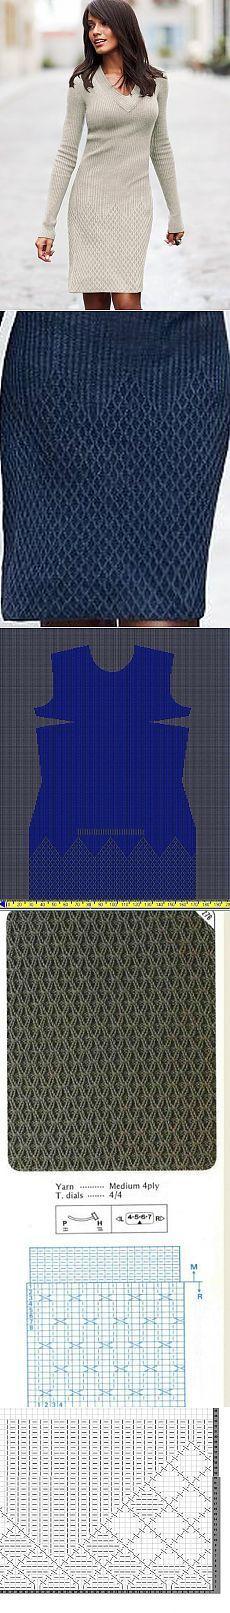 Ромбовый силуэт от Виктории Сикрет Beutiful knitted dress